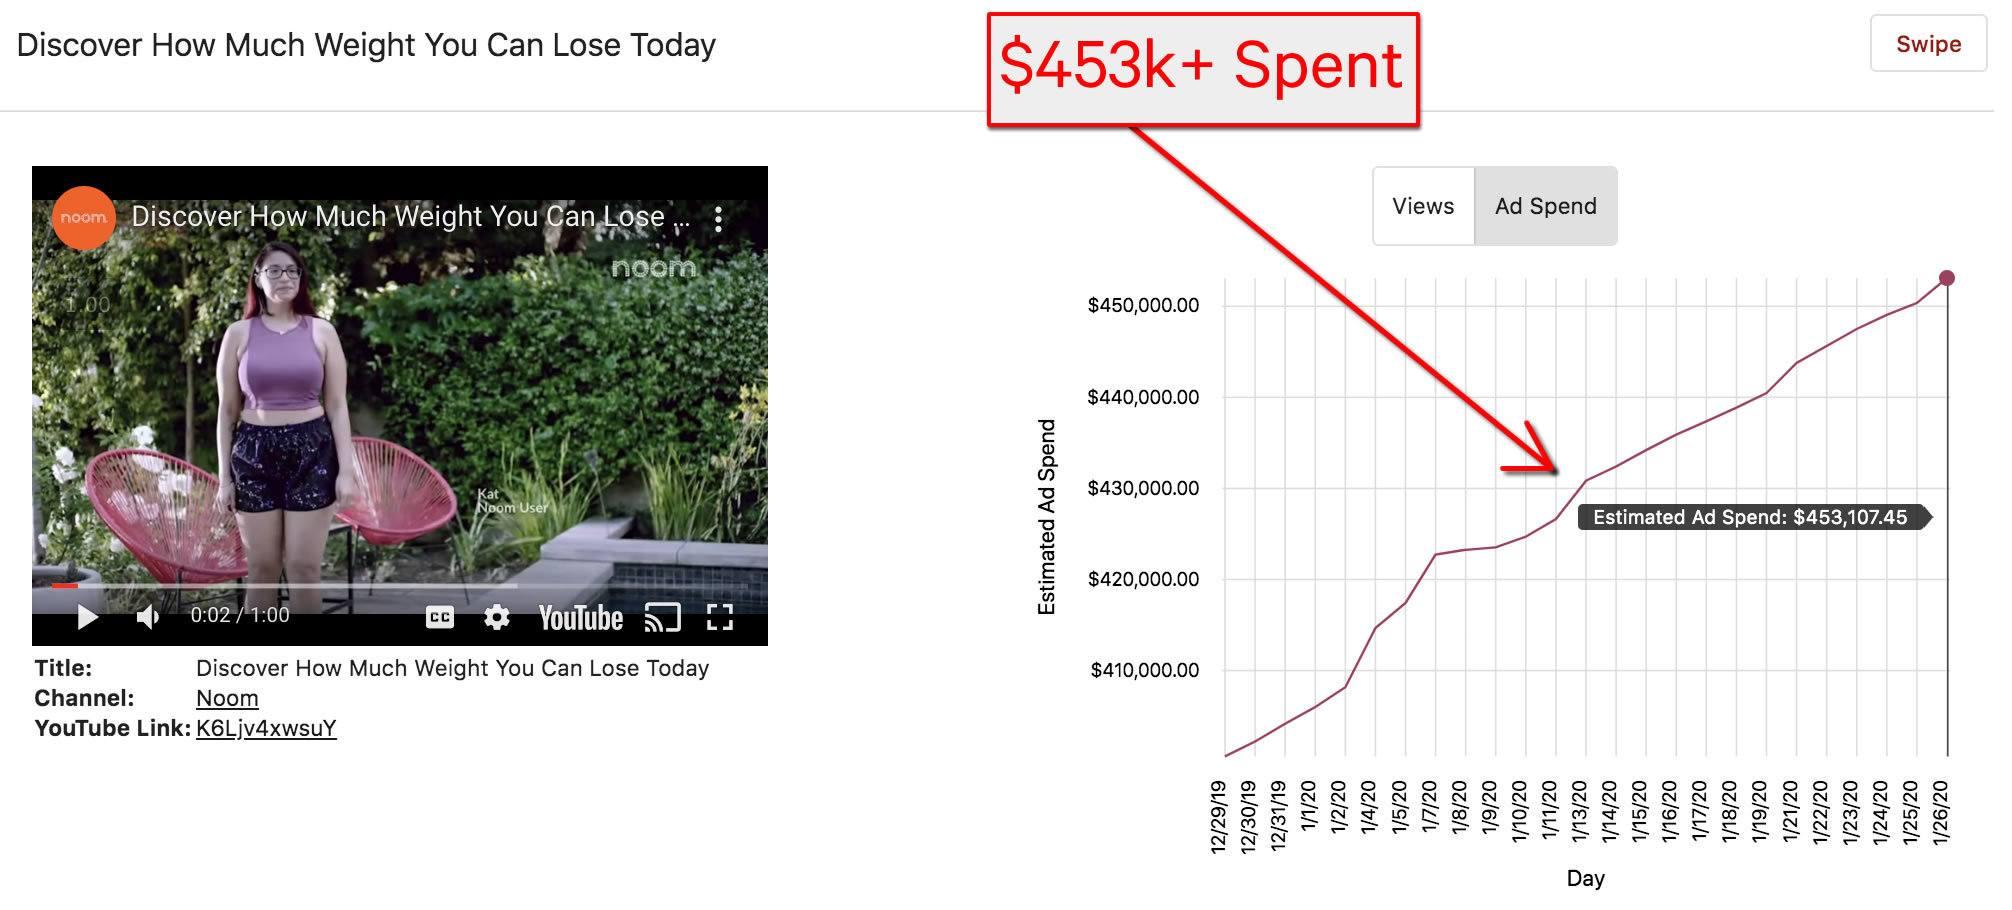 youtube-ad-spy-tool-screenshot-noom-new-v1-20200126